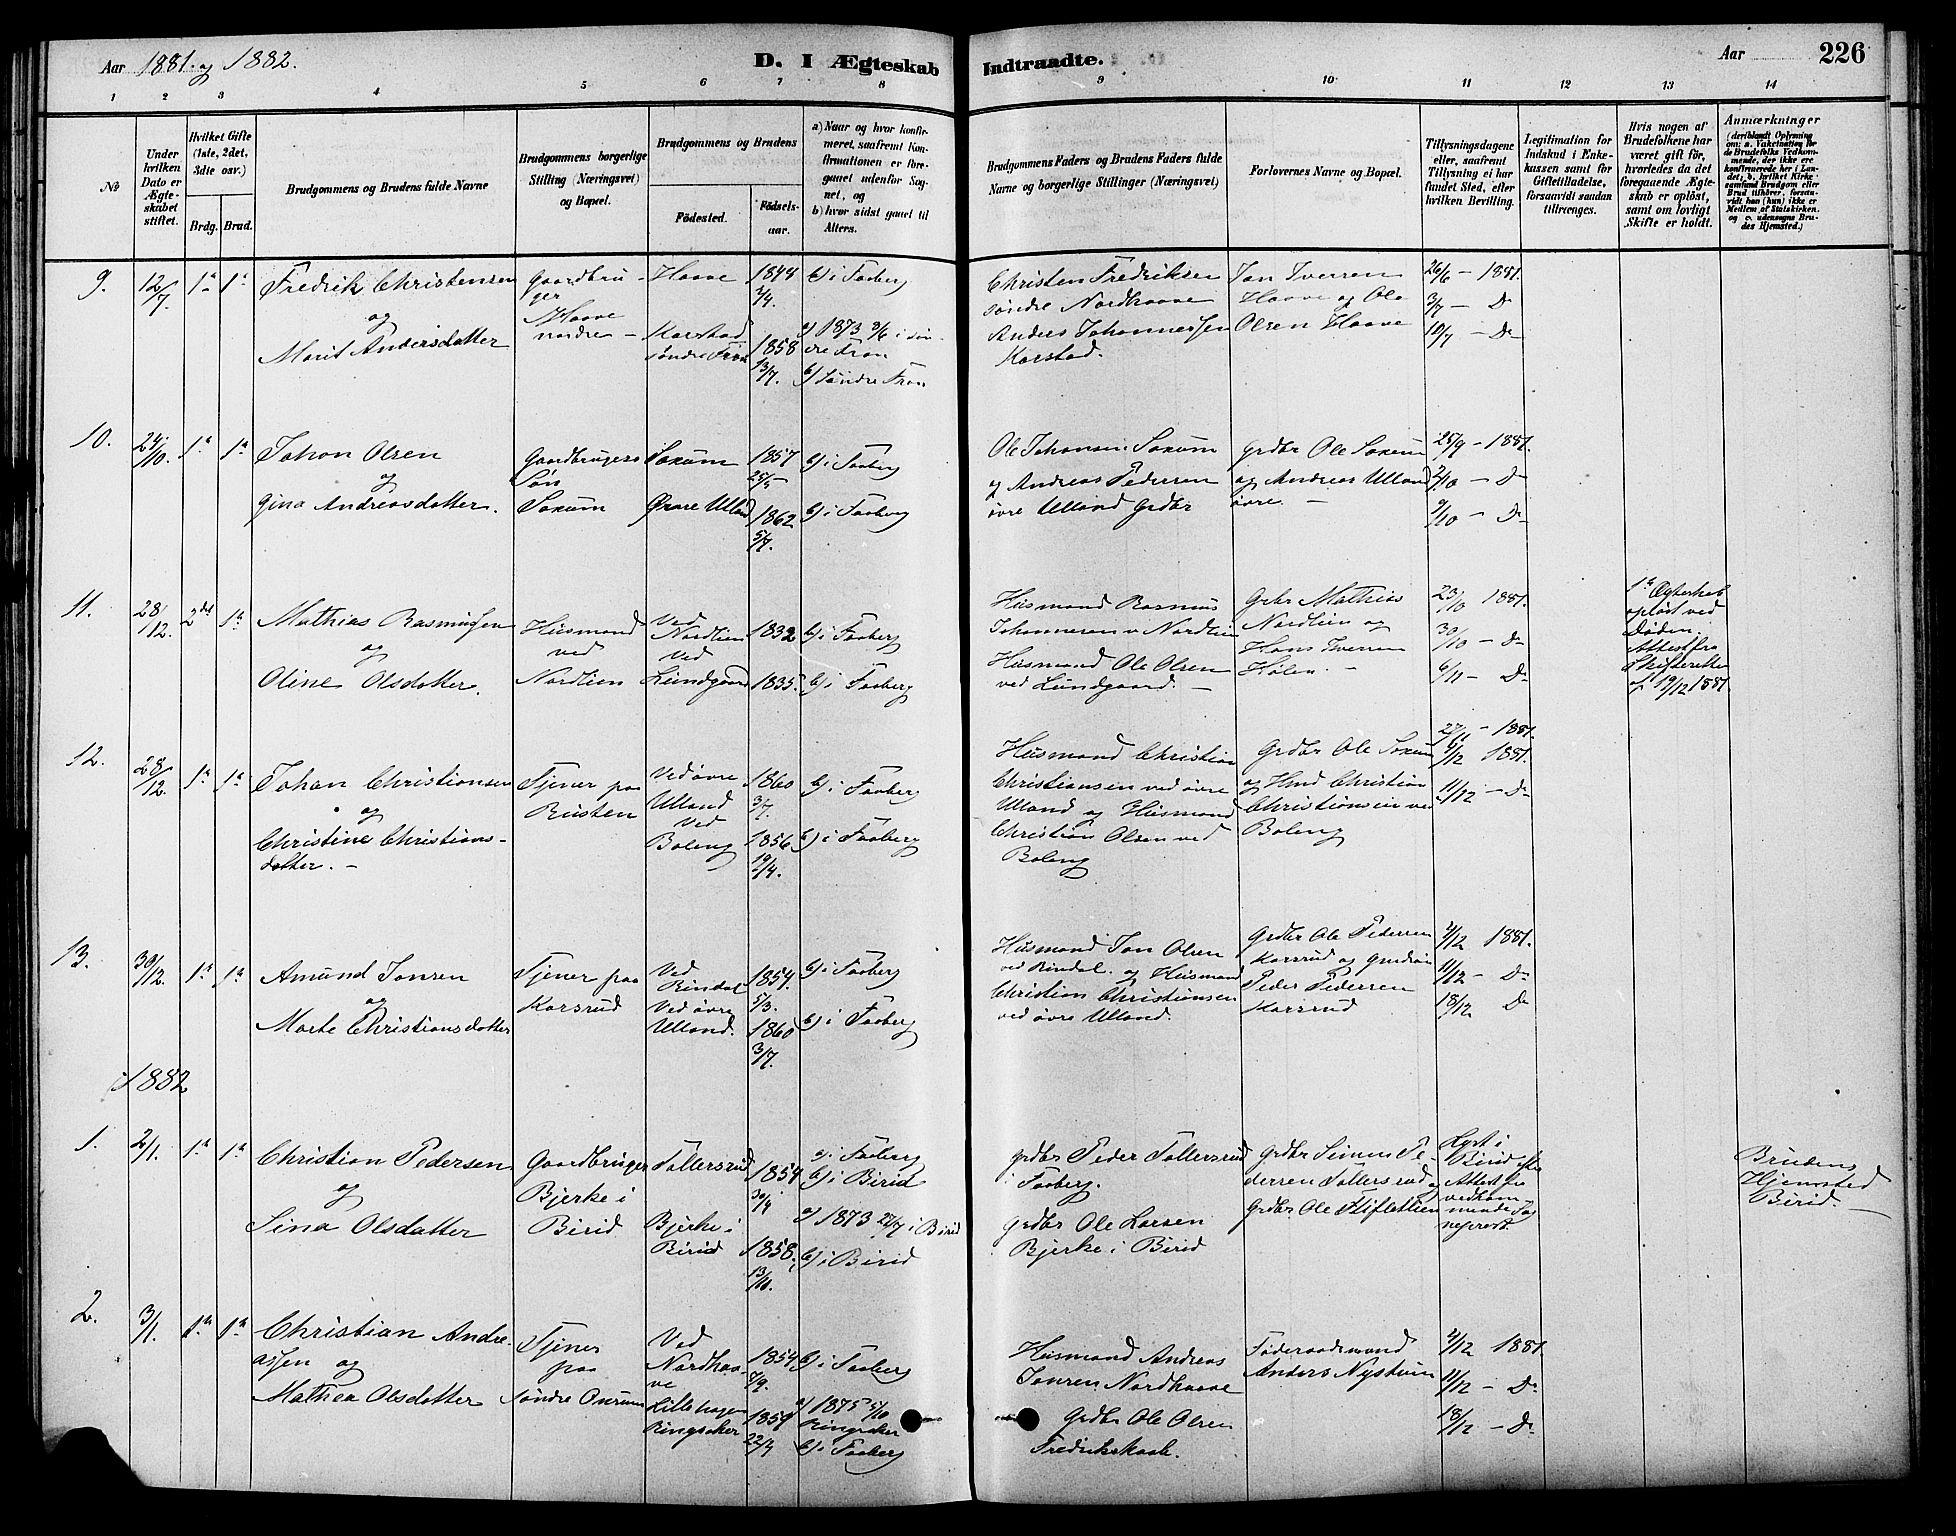 SAH, Fåberg prestekontor, Ministerialbok nr. 8, 1879-1898, s. 226